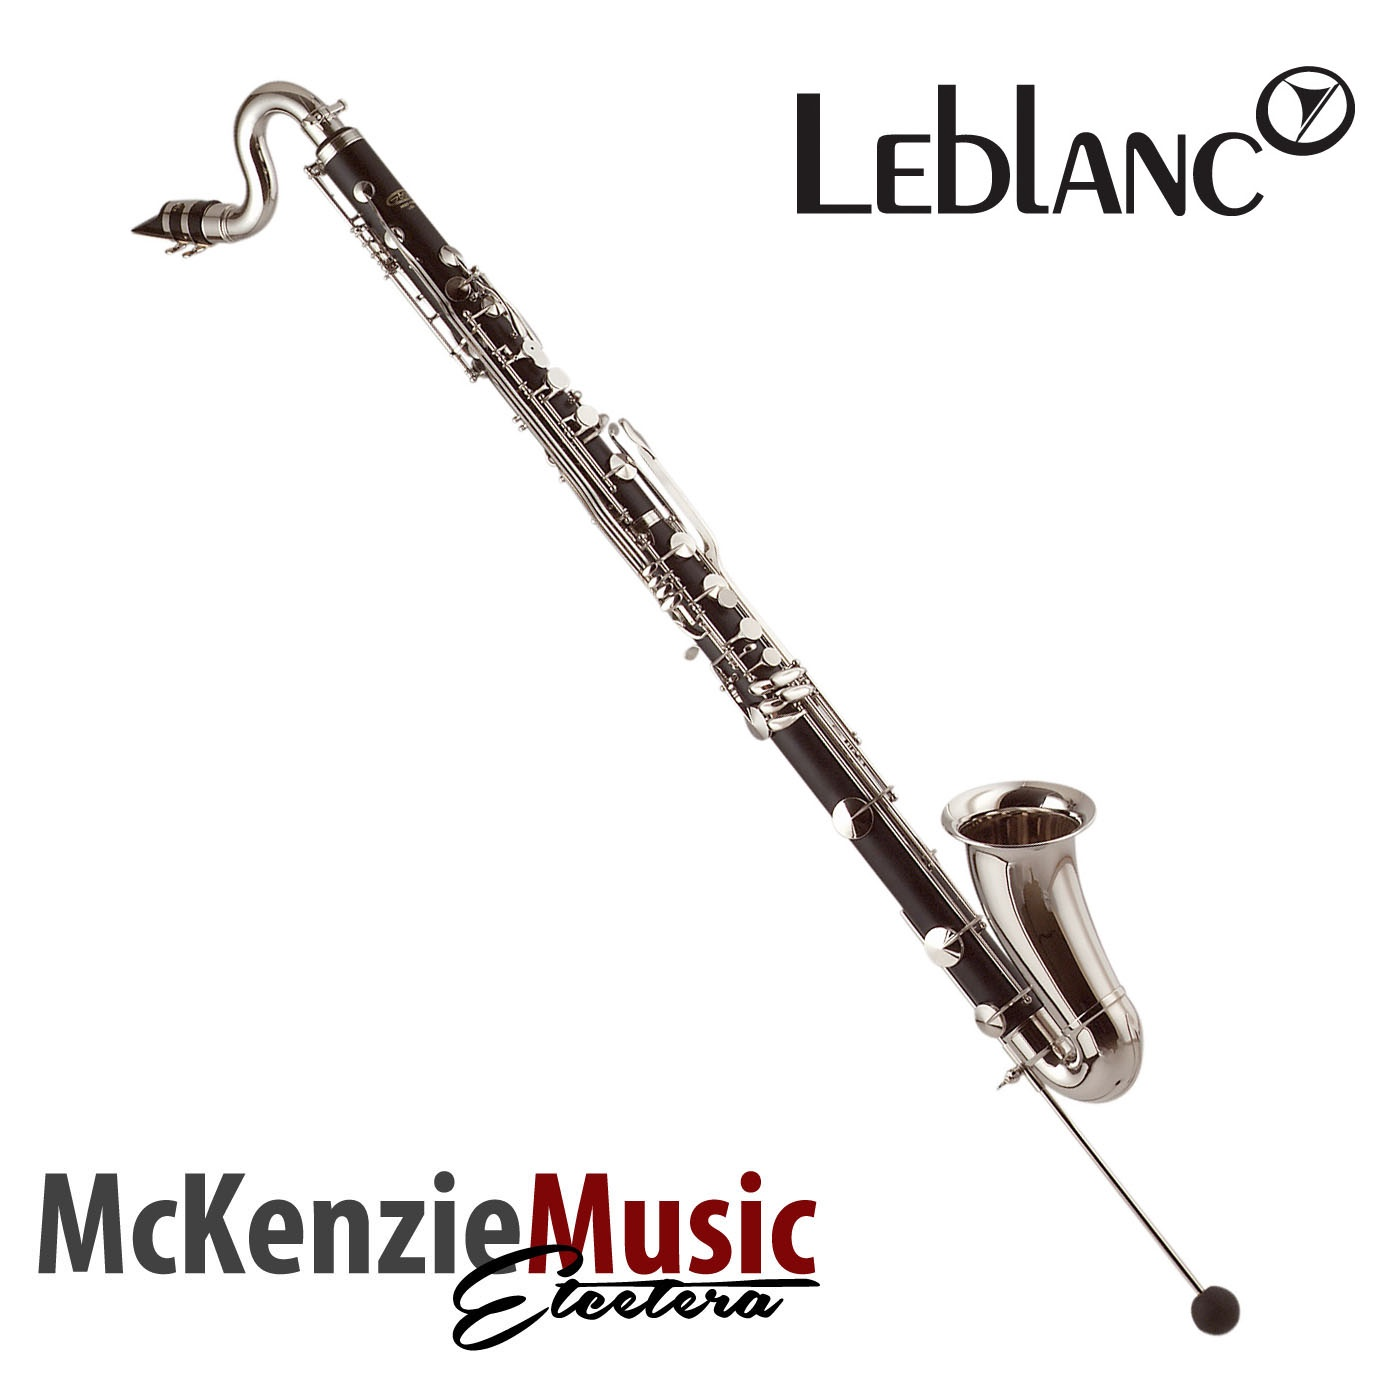 Leblanc Bass Clarinet LE7168